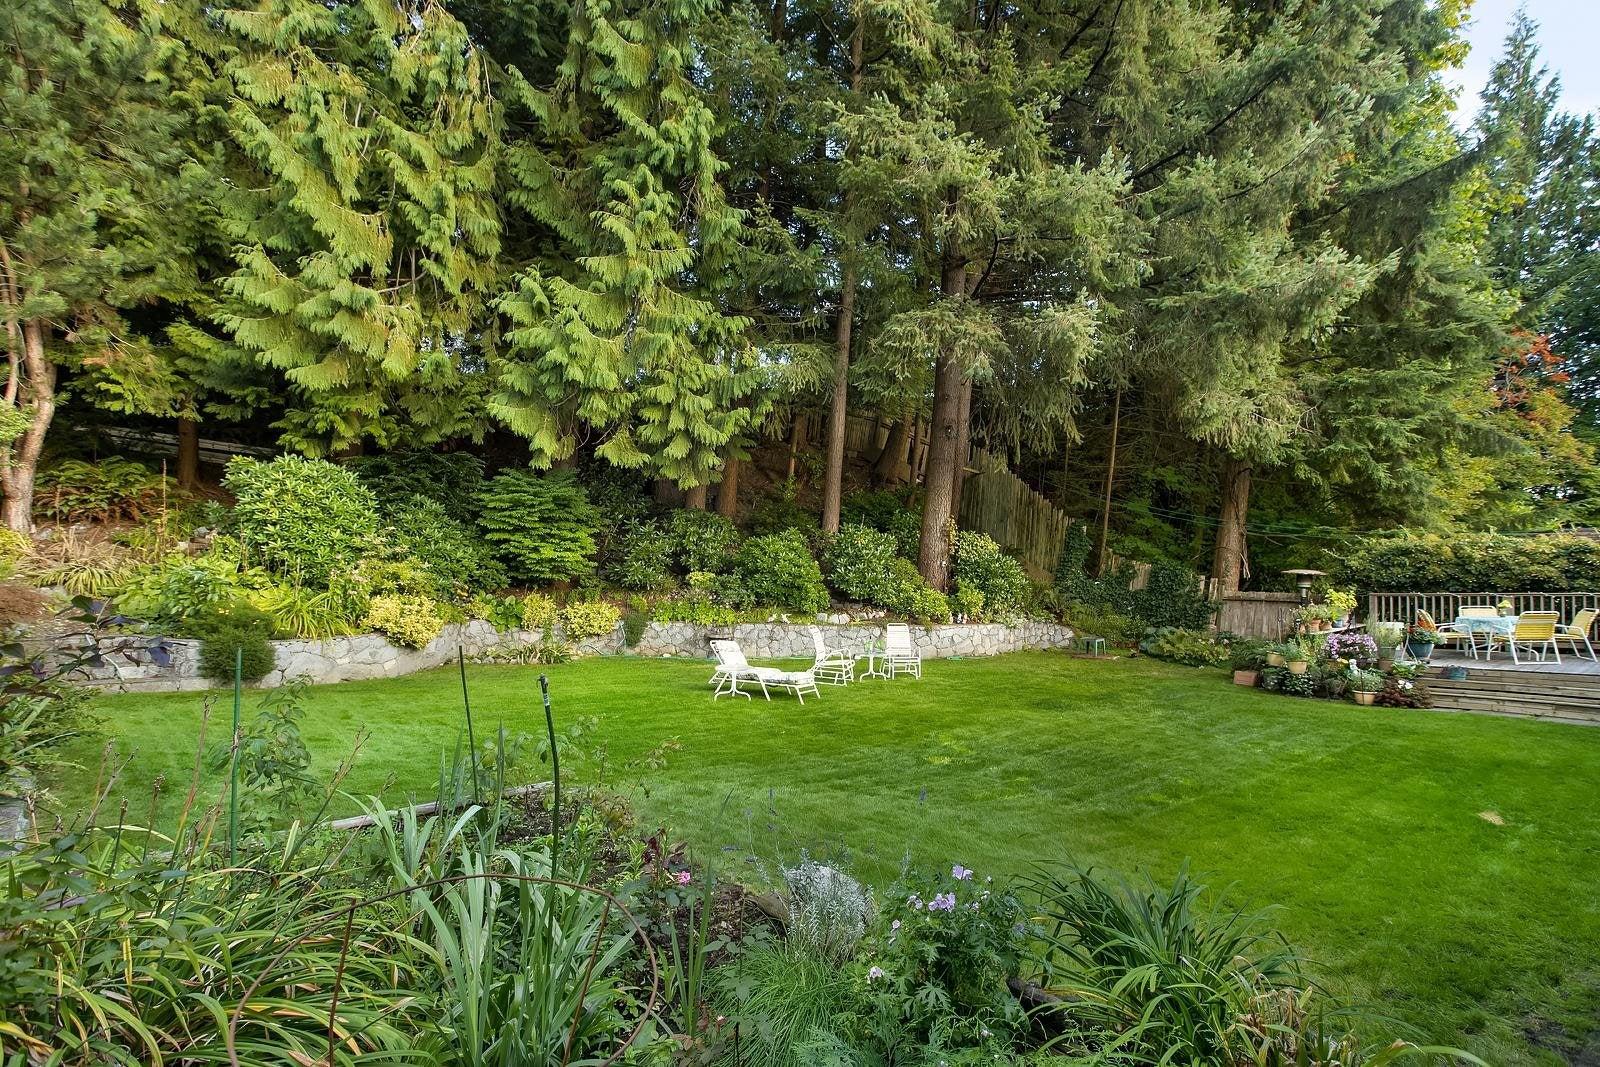 3495 WELLINGTON CRESCENT - Edgemont House/Single Family for sale, 3 Bedrooms (R2617949) - #8